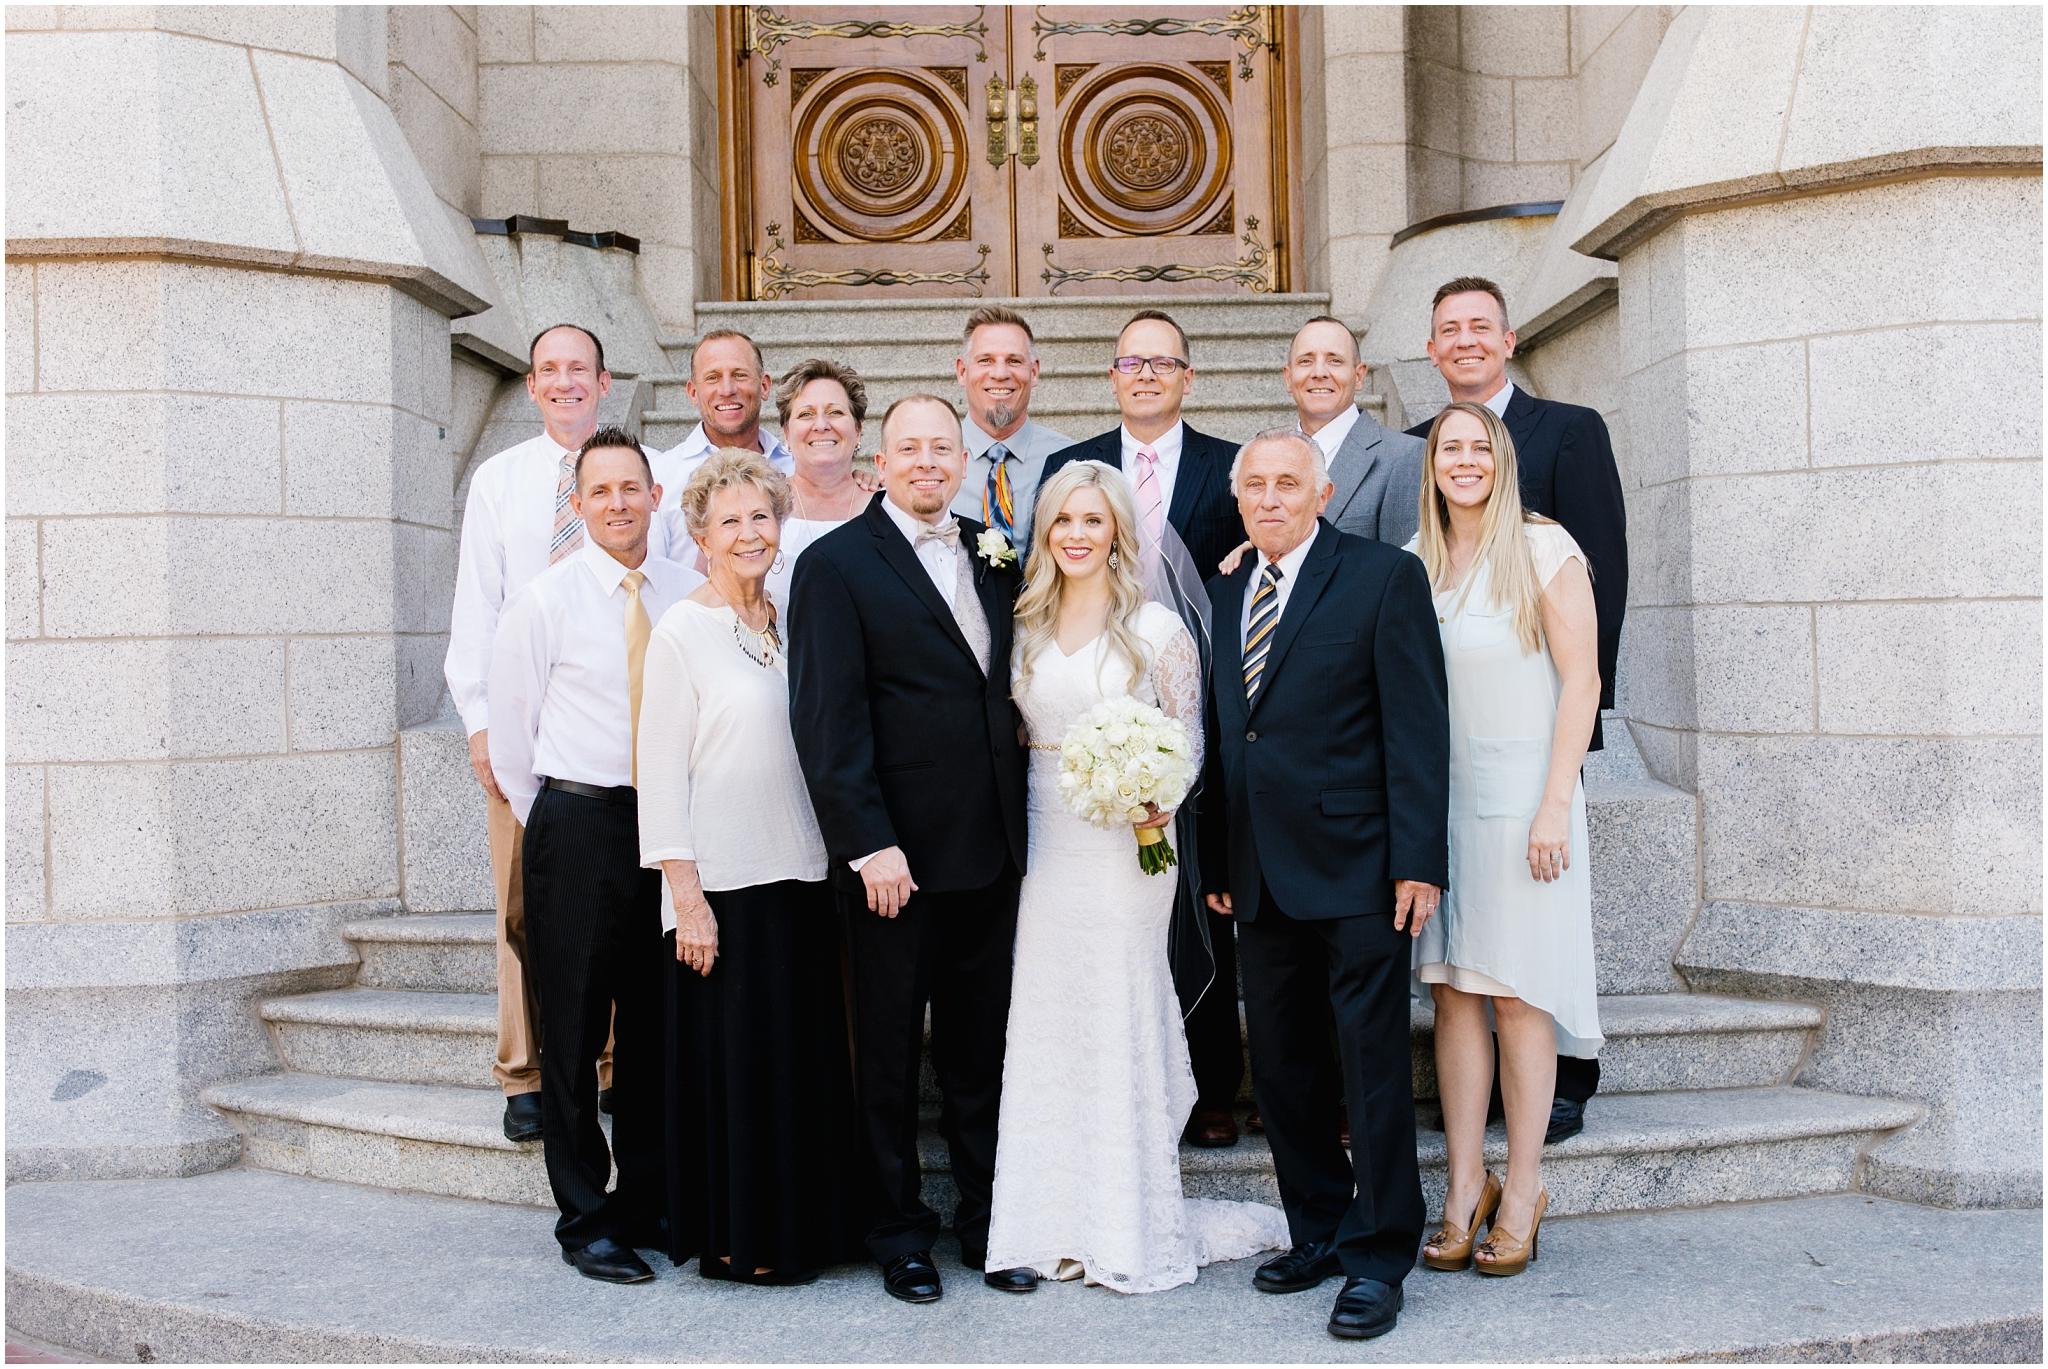 CherylandTyler-50_Lizzie-B-Imagery-Utah-Wedding-Photographer-Salt-Lake-City-Temple-Wells-Fargo-Building-Reception.jpg